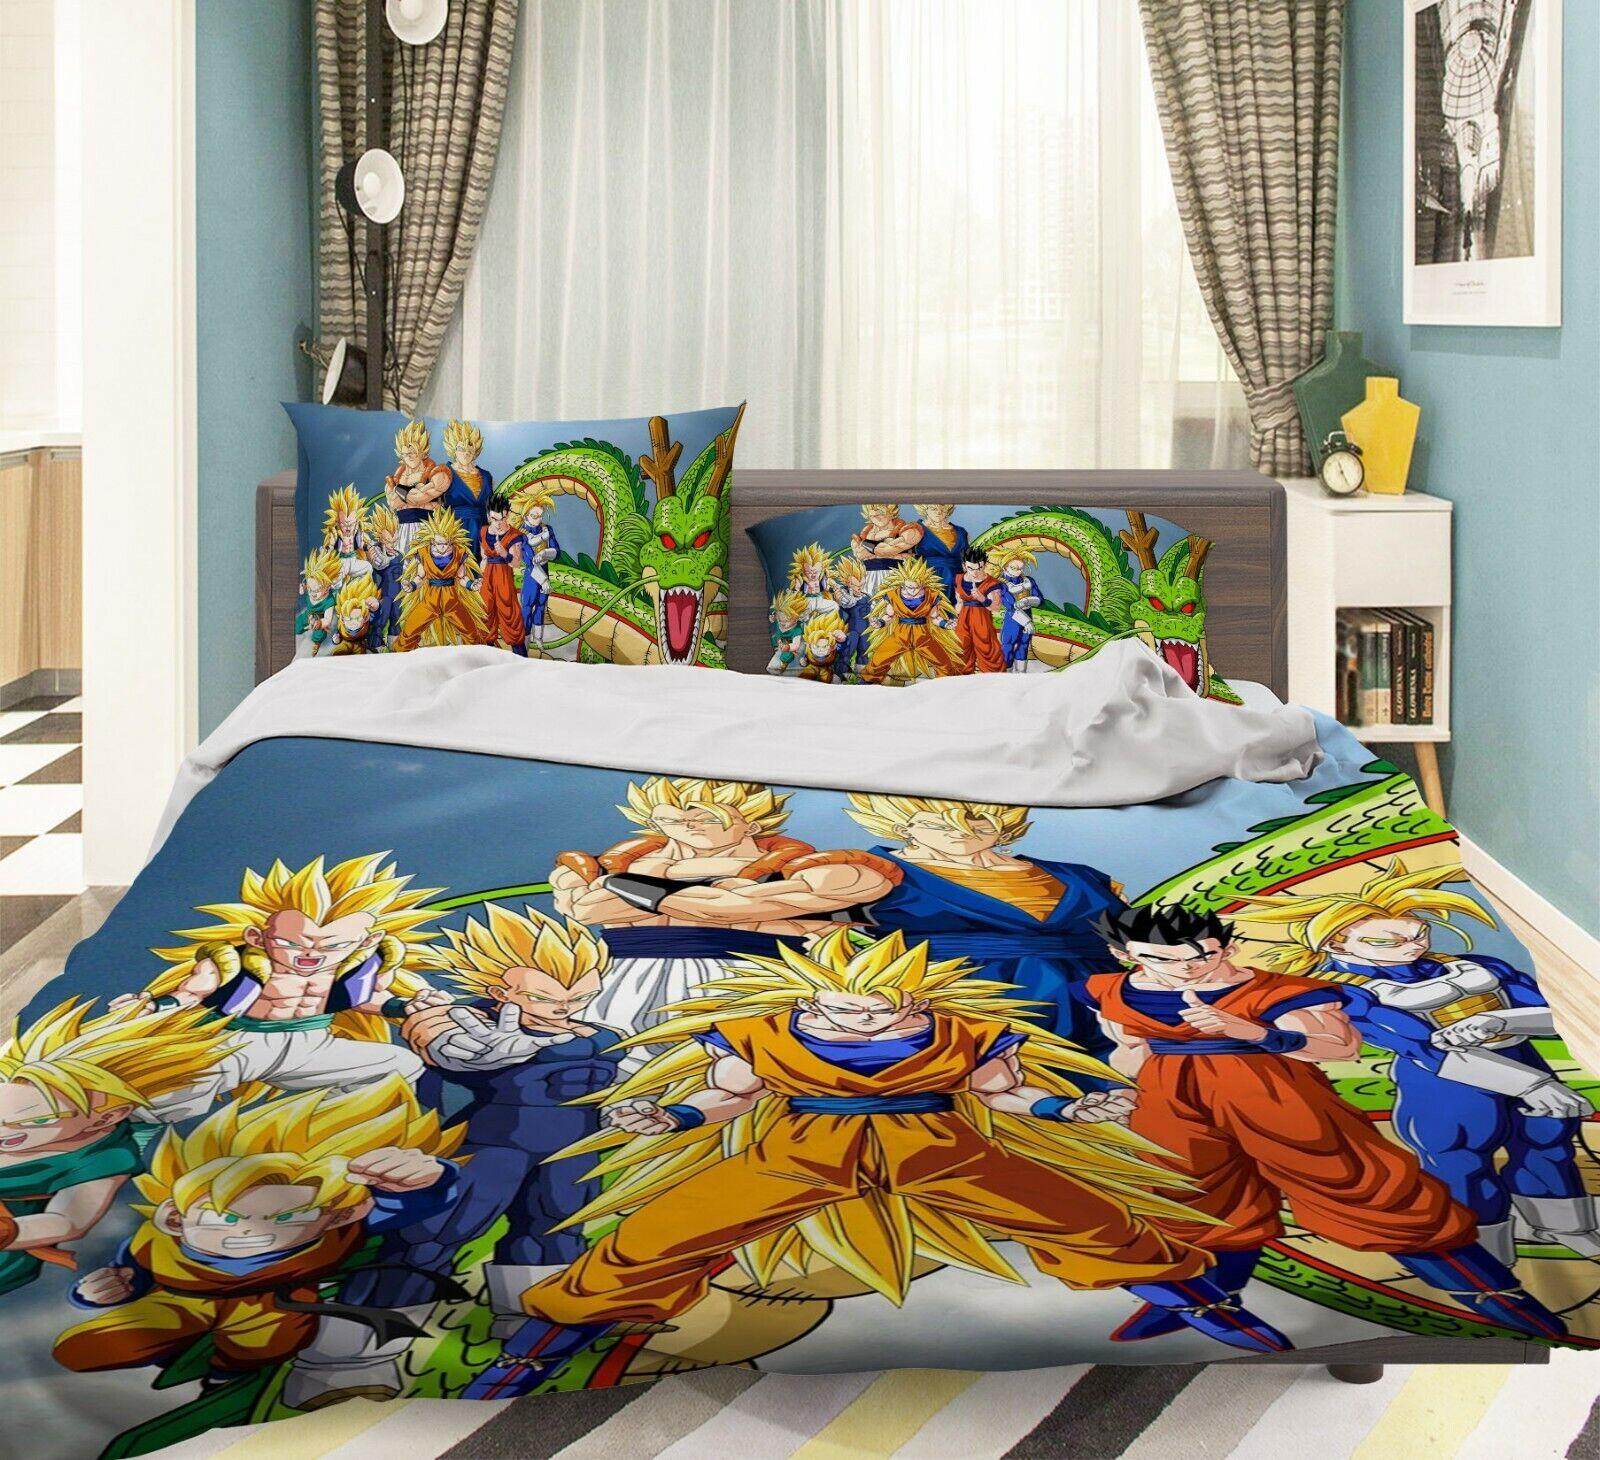 3D Fighting Boys G57 Japan Anime bed Pillowcases Duvet Cover Quilt Cover Acmy